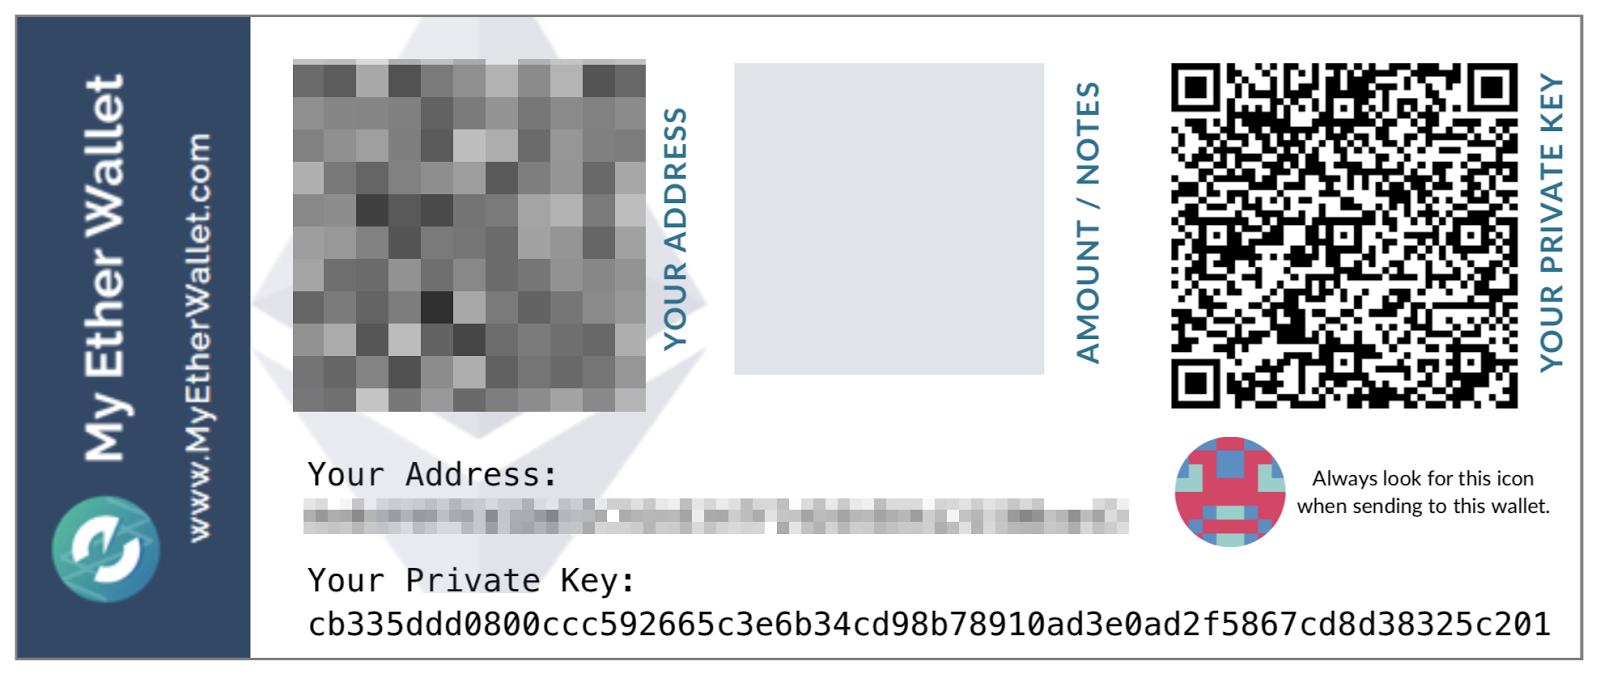 Com'è fatta una chiave privata Ethereum